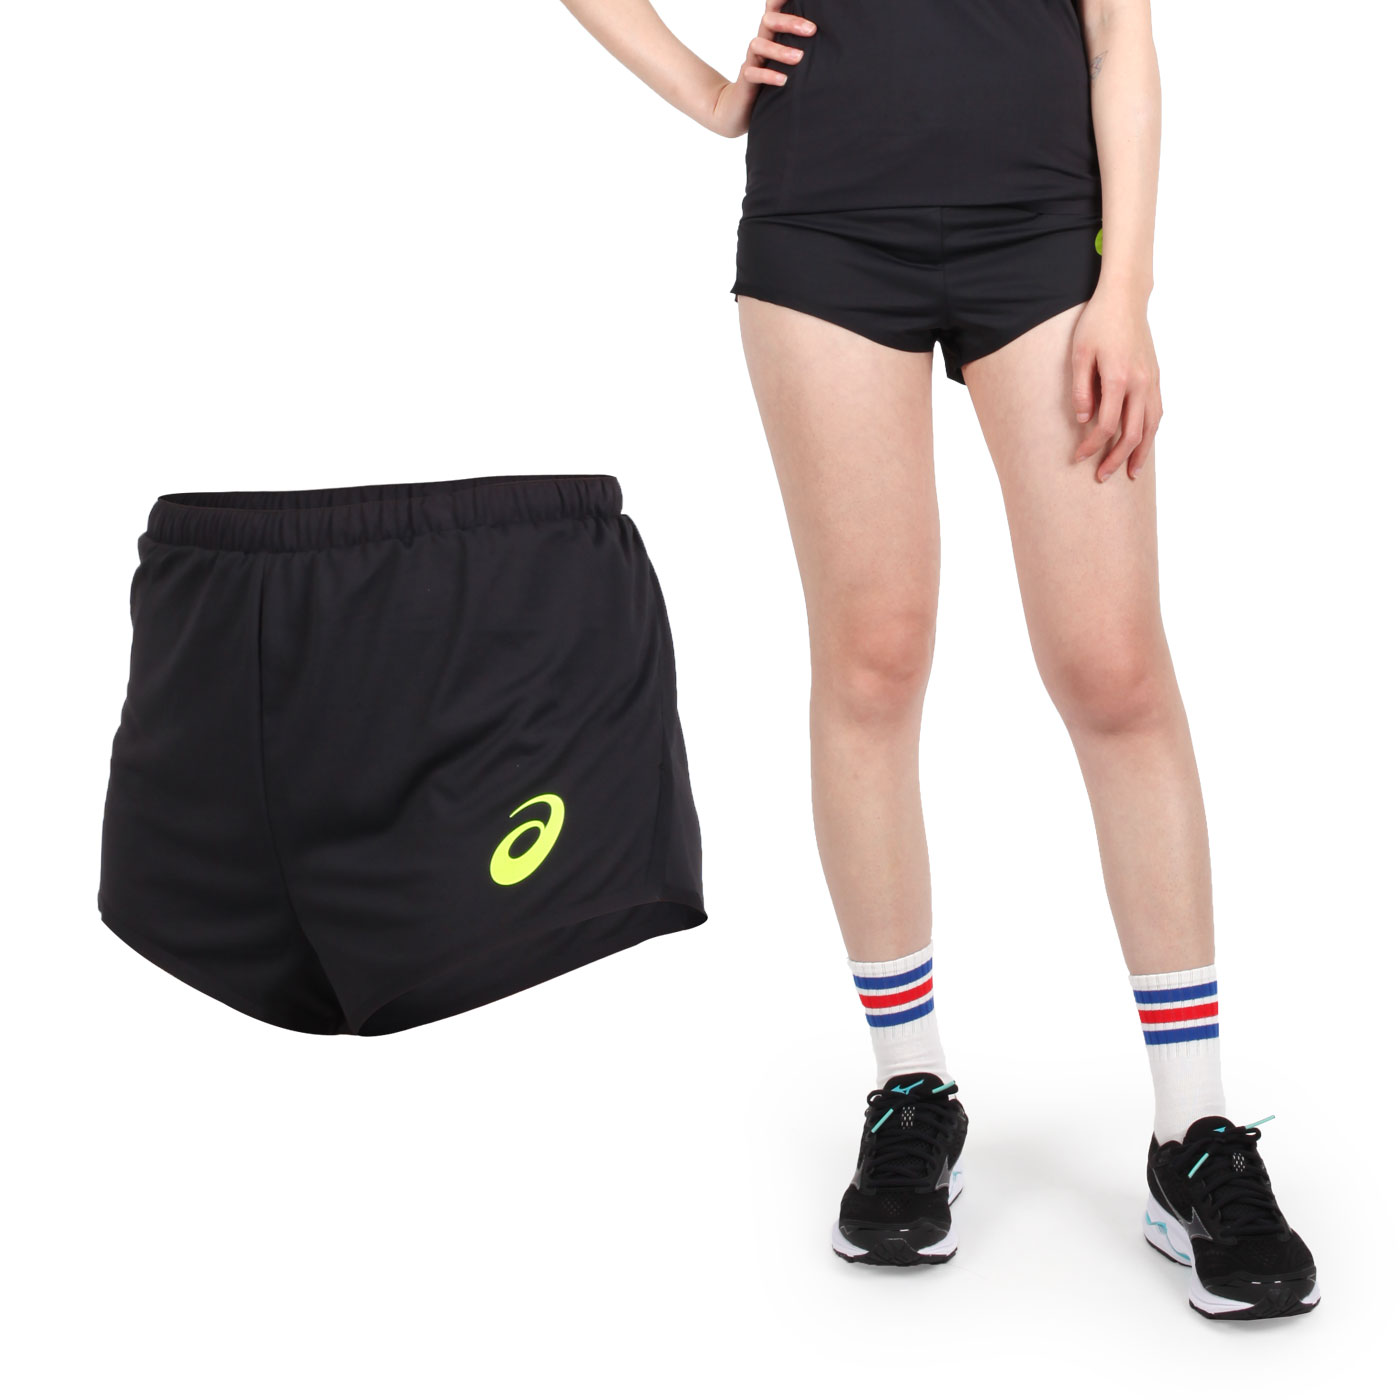 ASICS 女田徑短褲 2092A029-001 - 黑螢光綠